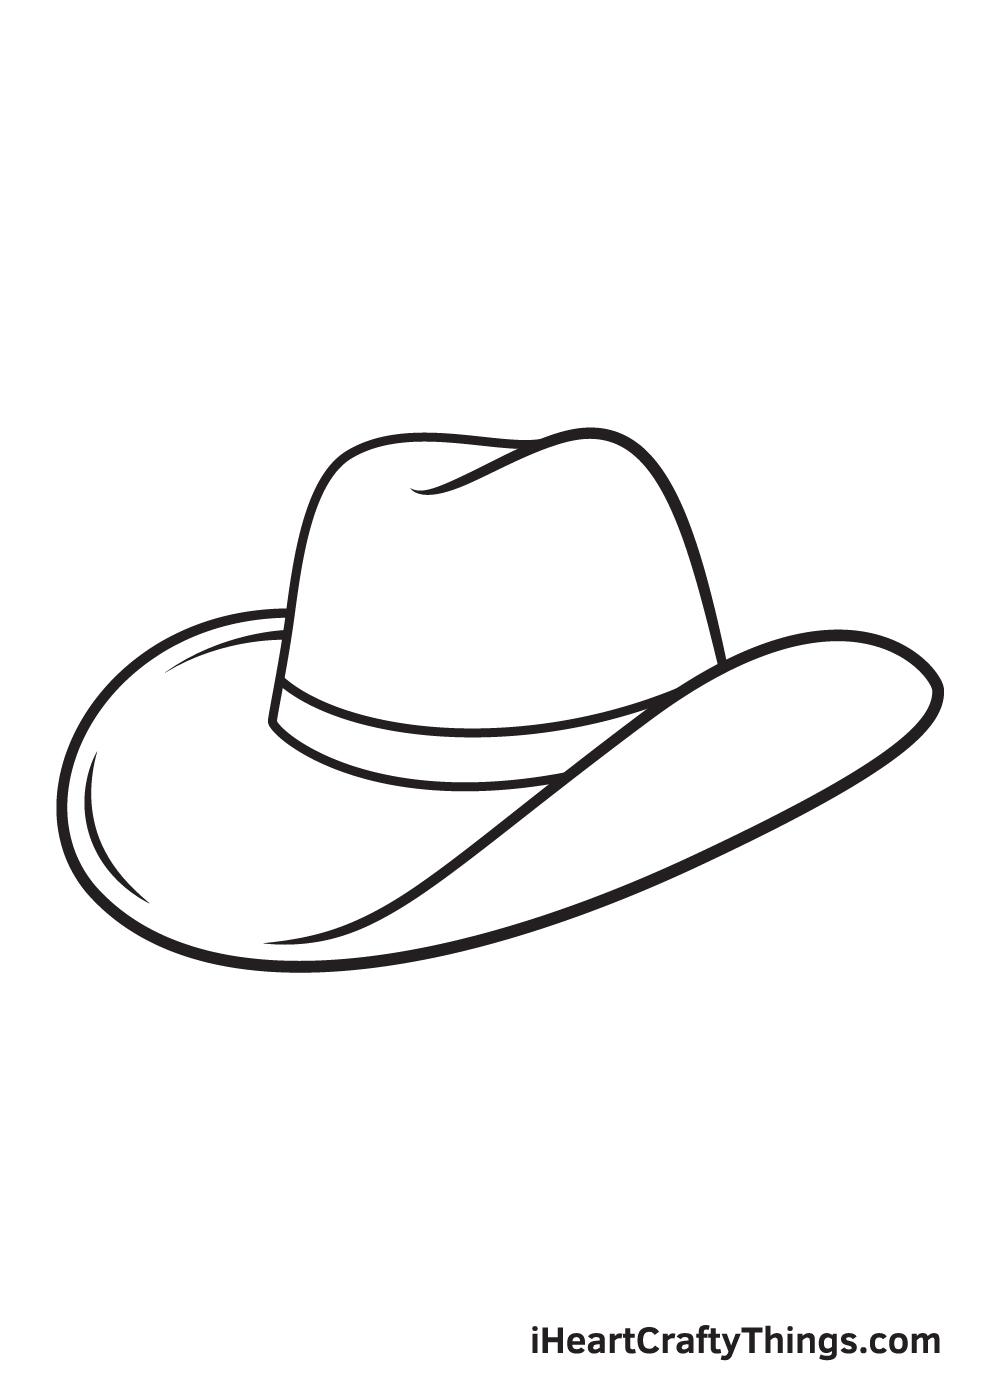 cowboy hat drawing - step 8